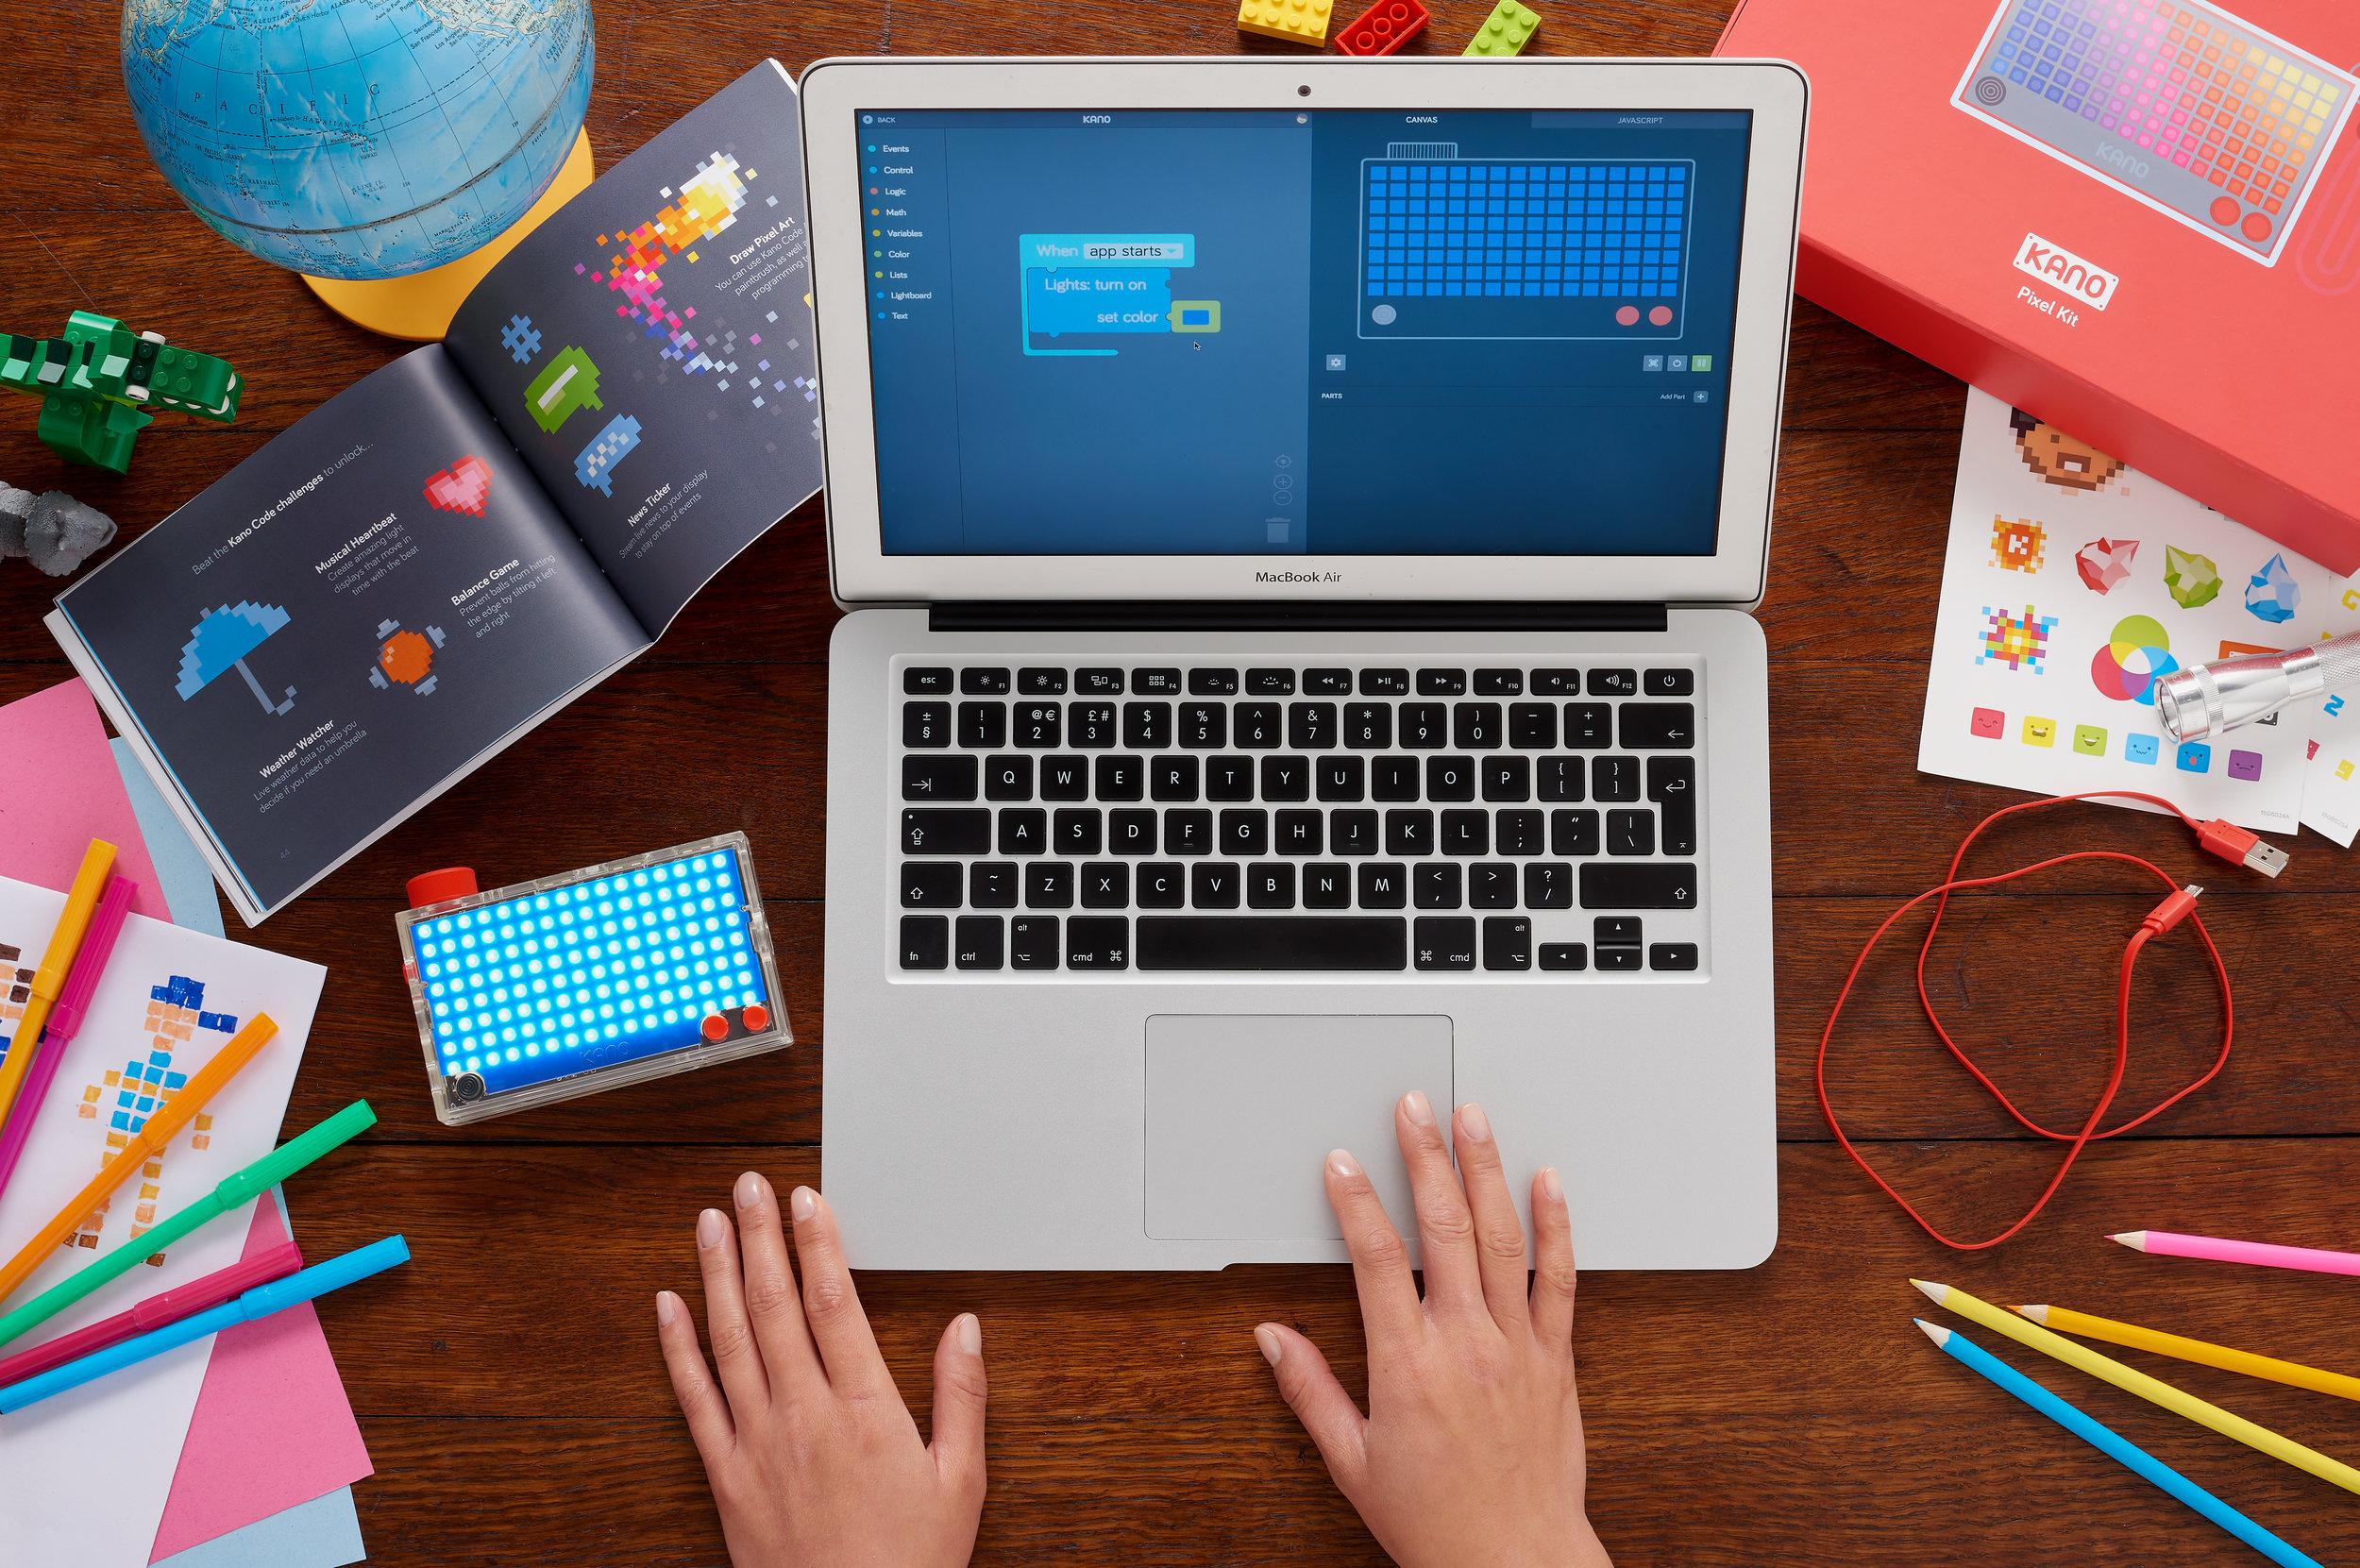 Pixelkit_Wood_Laptop_RGB.jpg